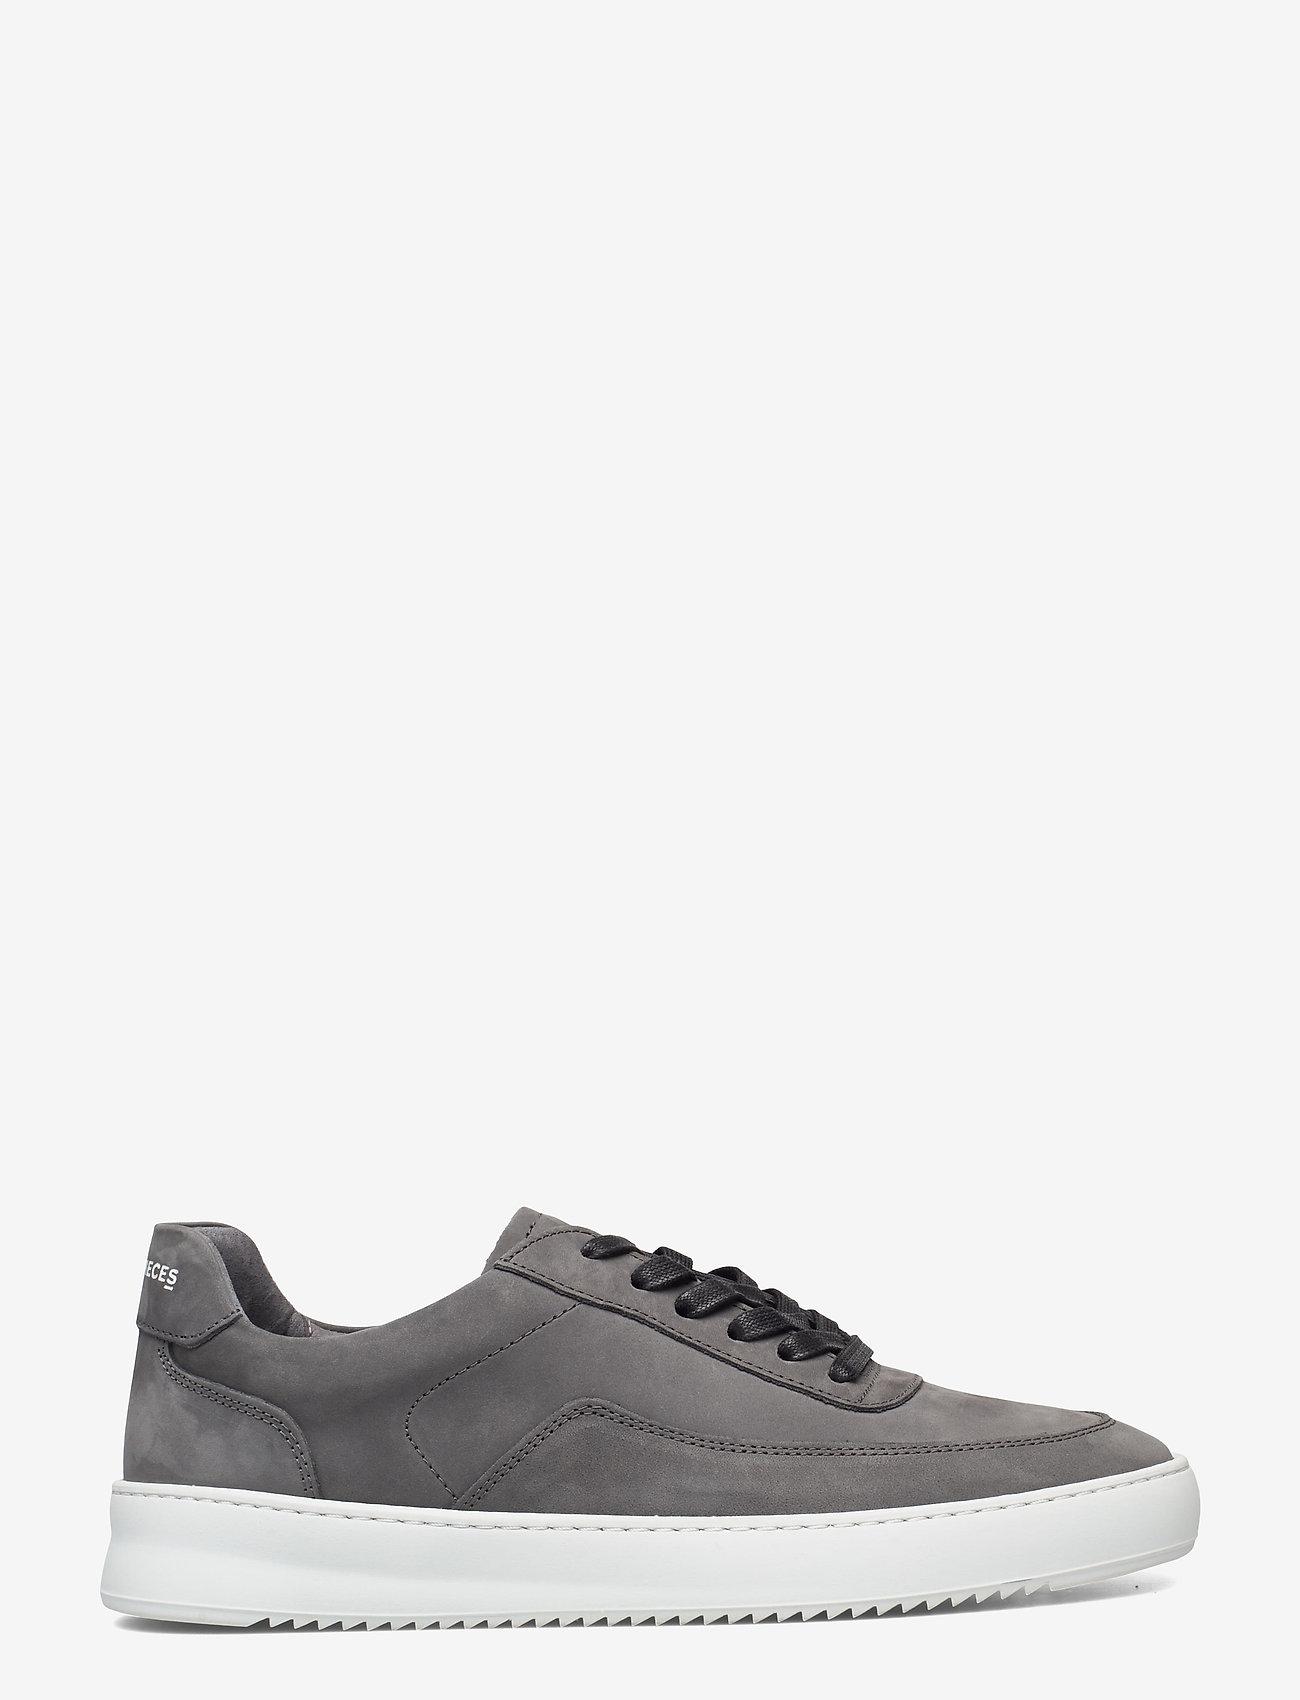 Filling Pieces - Mondo 2.0 Ripple Nubuck - låga sneakers - grey - 0